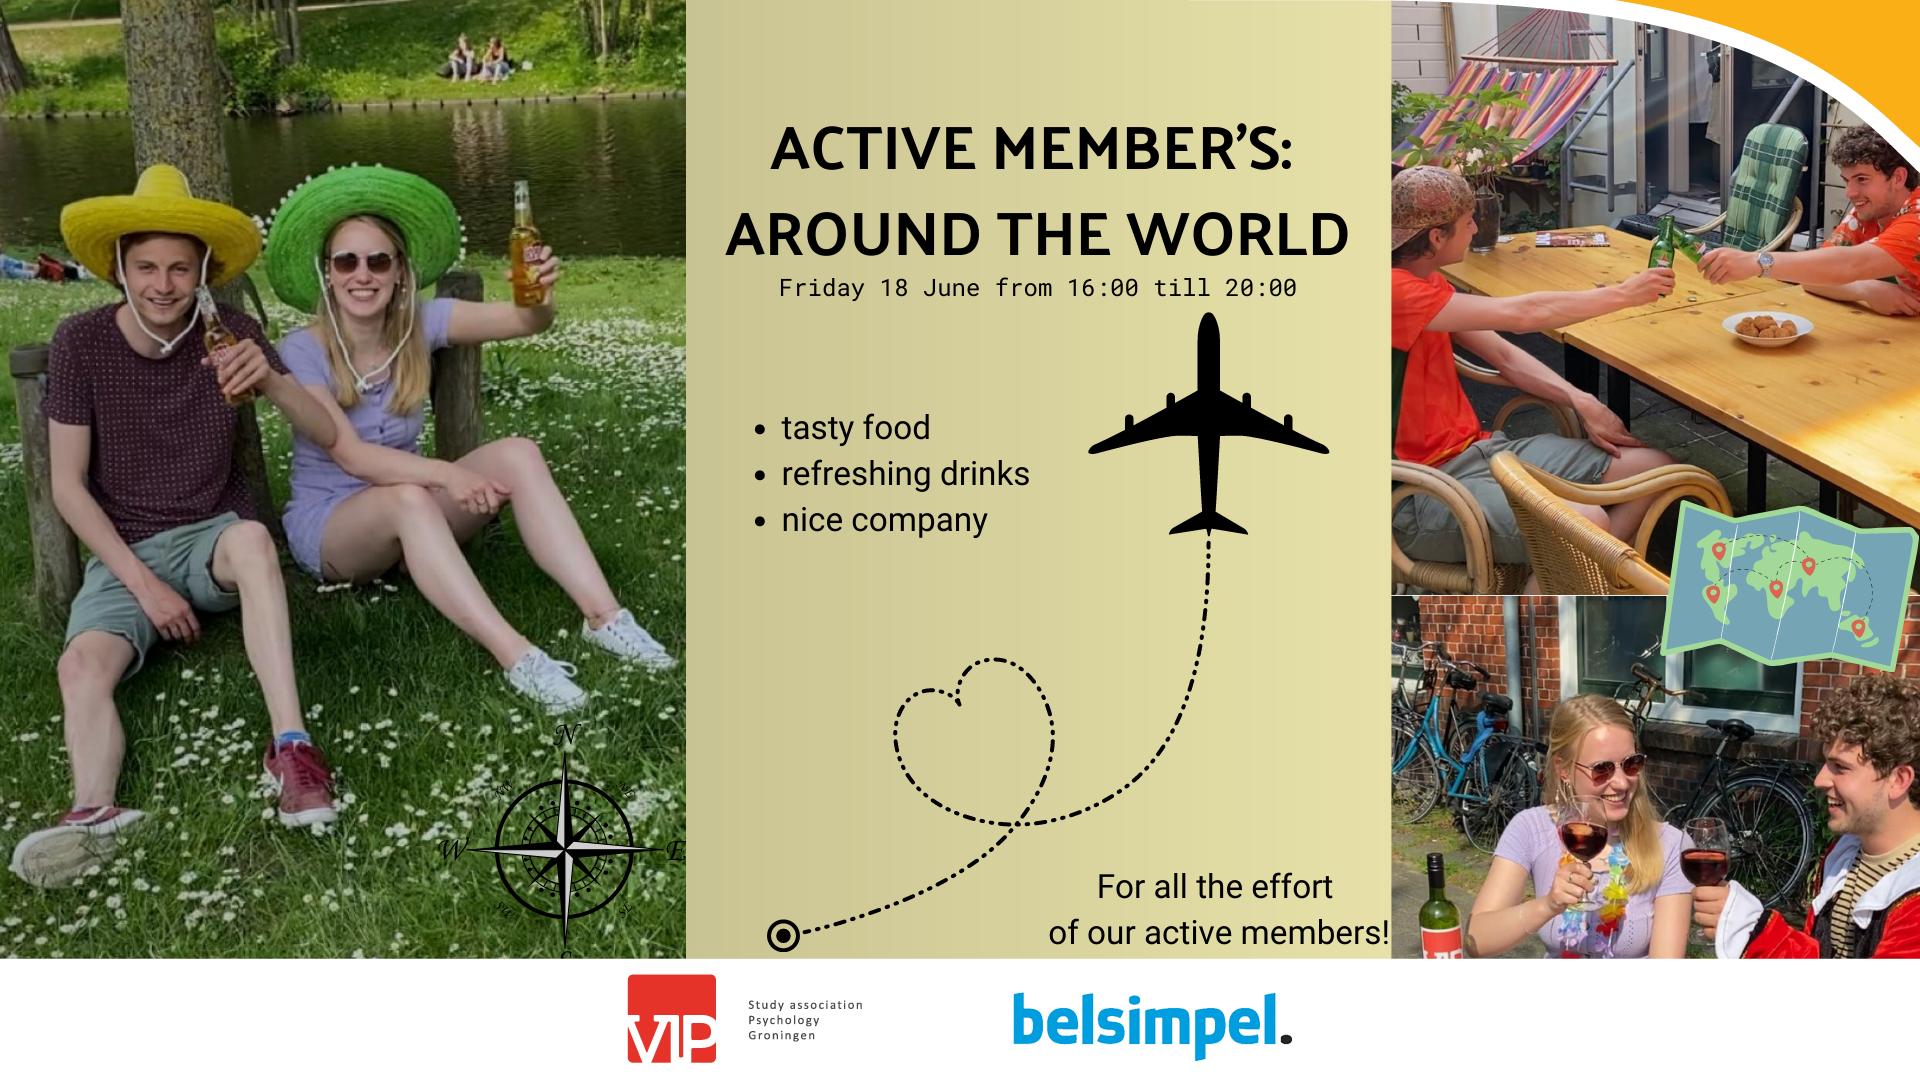 Active Members: Around the world